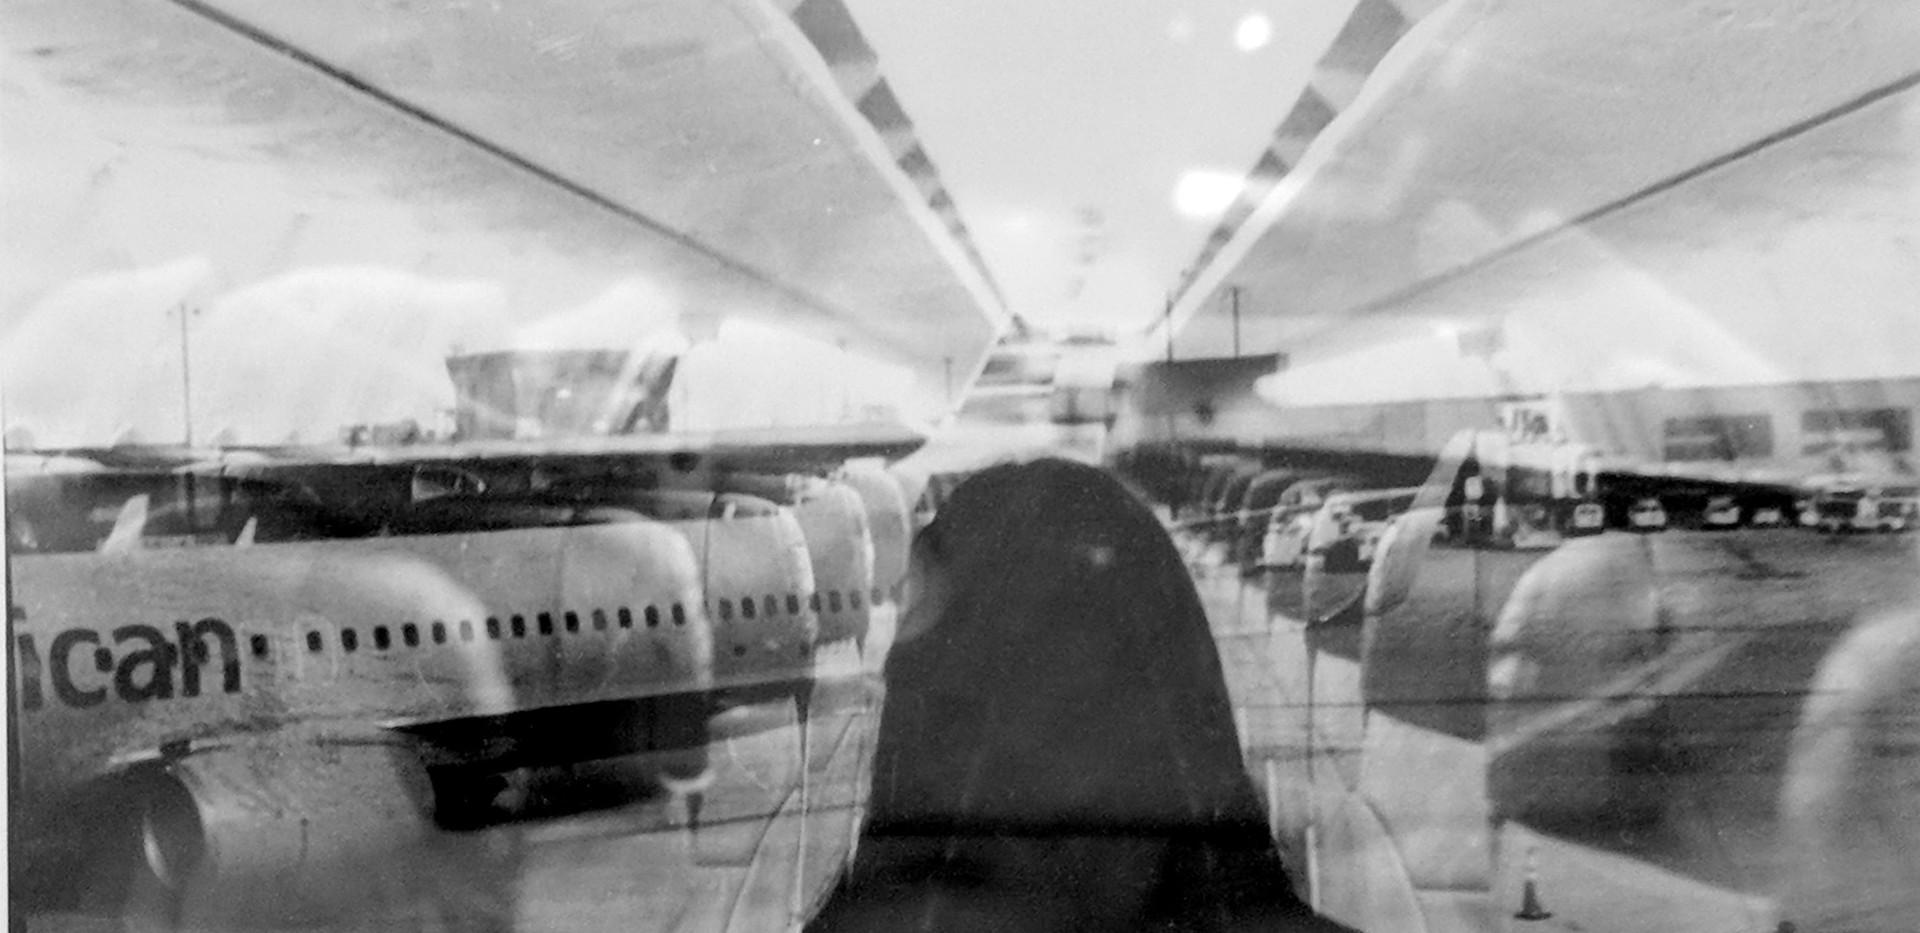 Double Exposure plane_edited.jpg